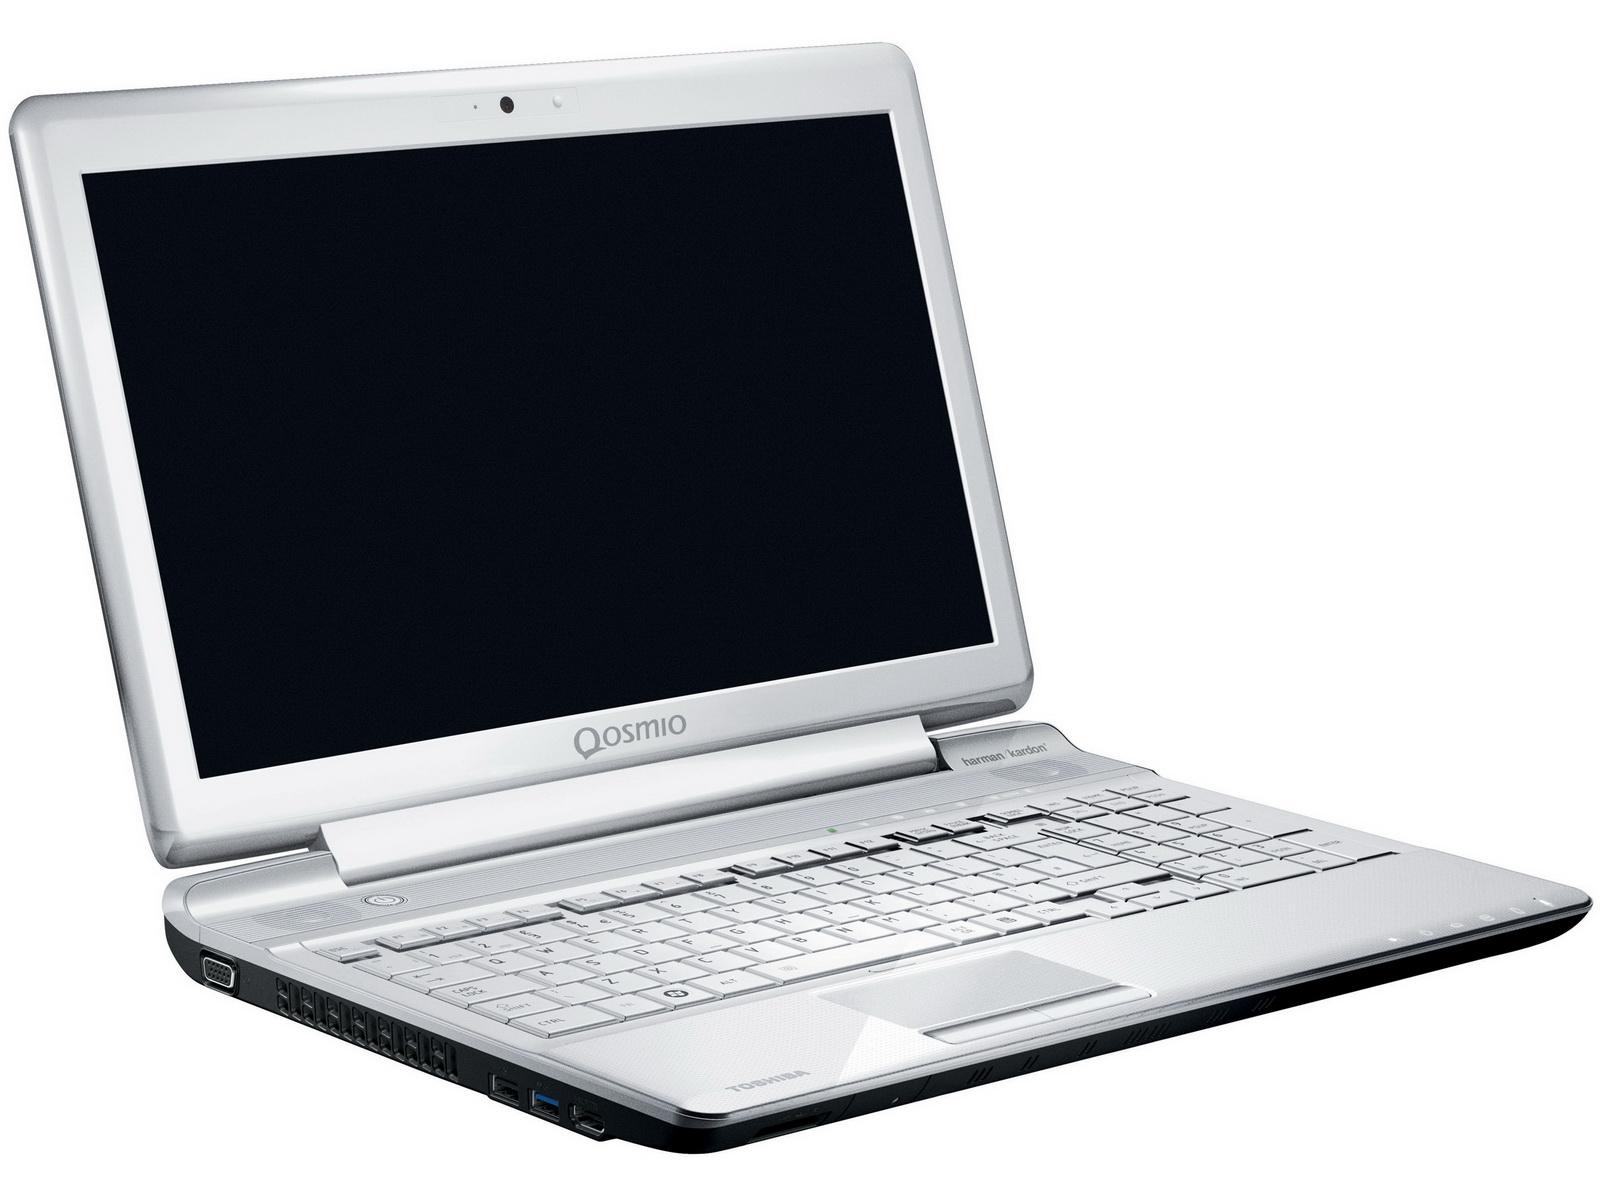 Toshiba Qosmio Und Satellite Notebooks Nun Mit Intel Core I7